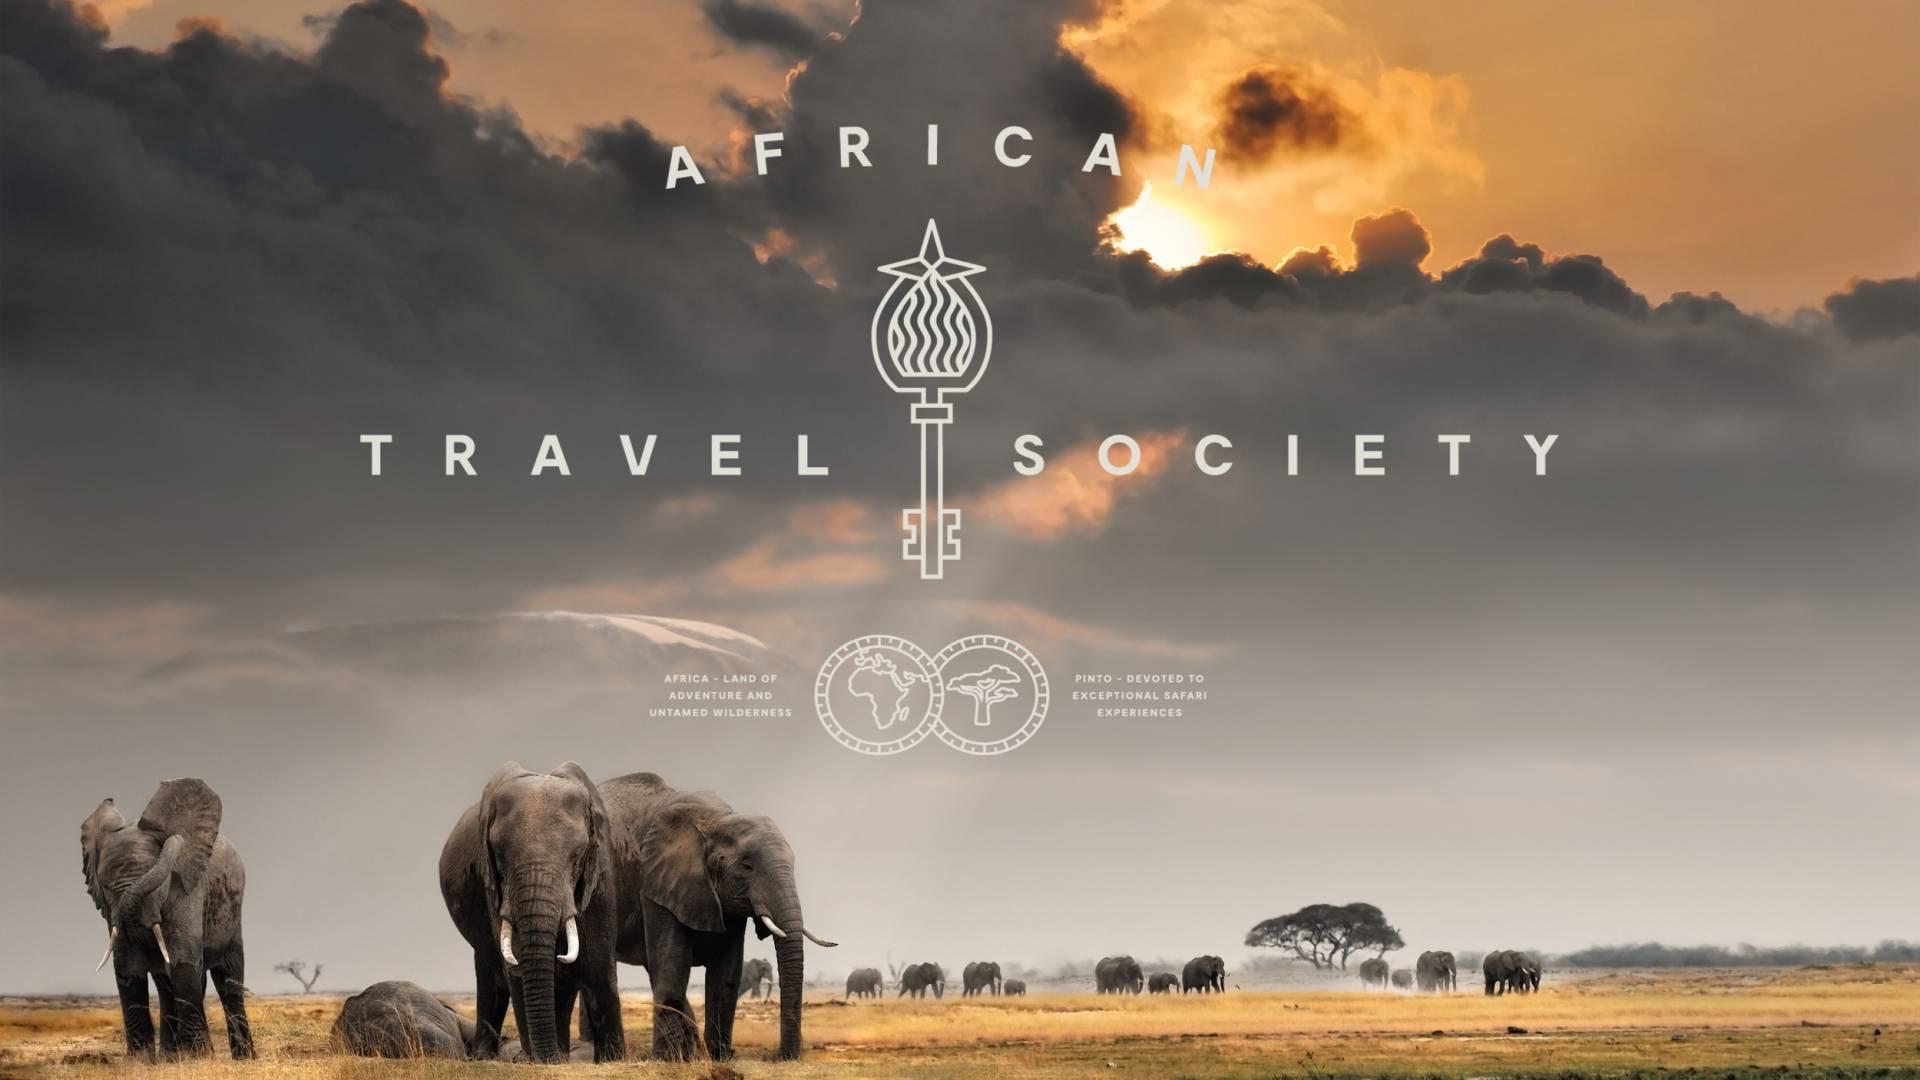 Elephanten im Serengeti Tansania - Travel Africa Society